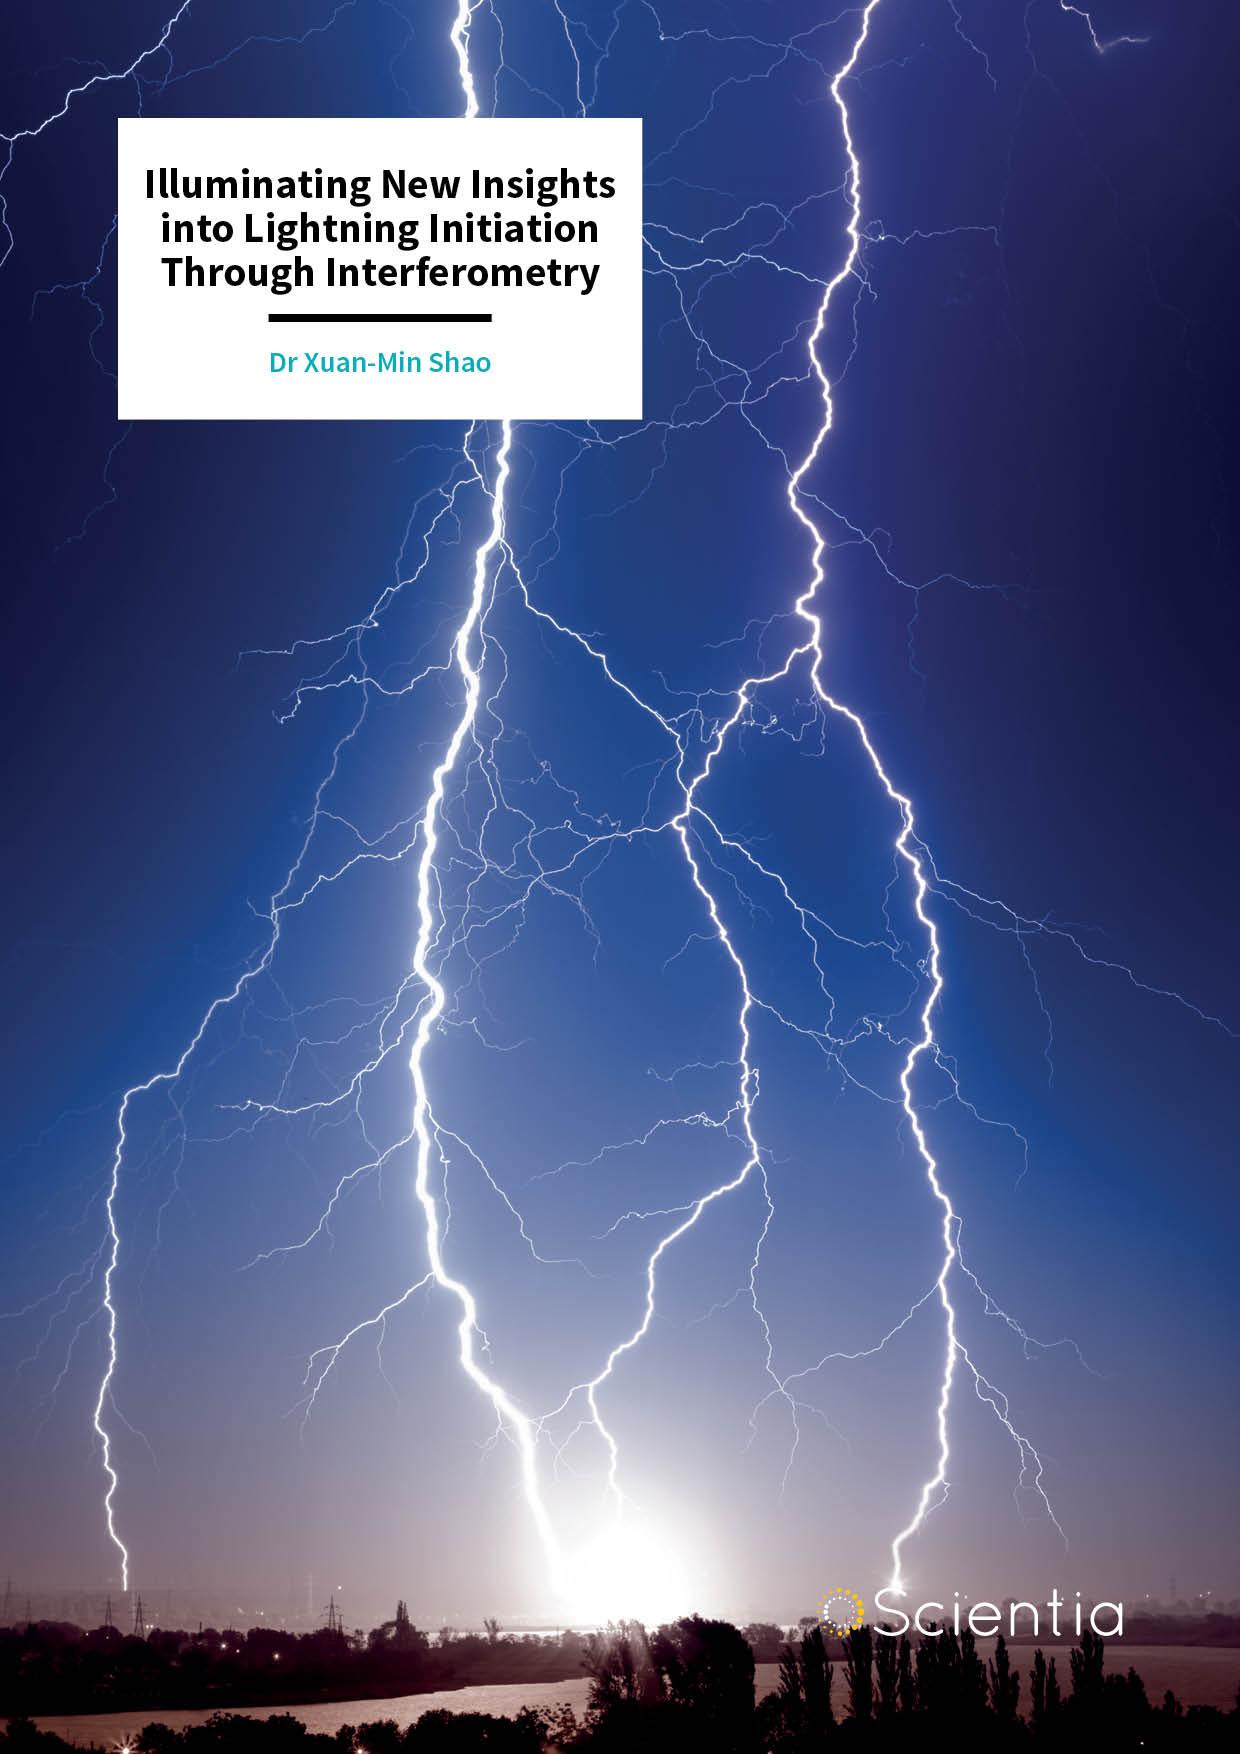 Dr Xuan-Min Shao – Illuminating New Insights into Lightning Initiation Through Interferometry